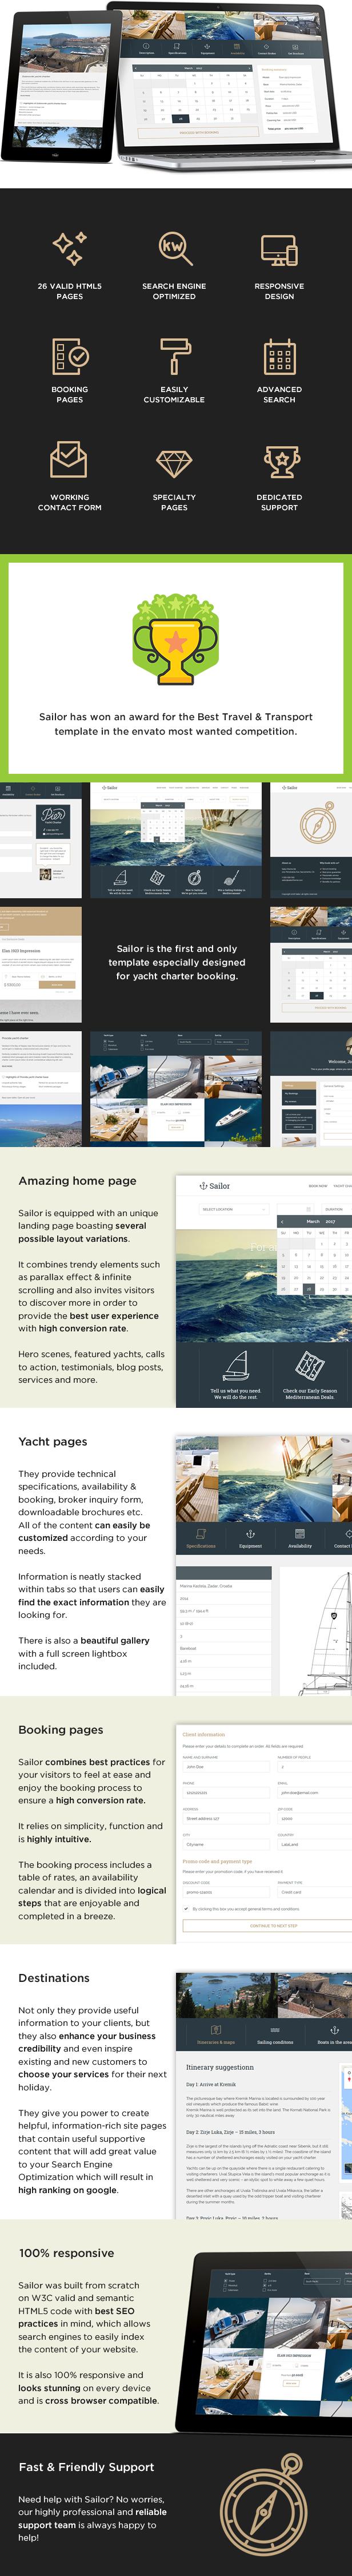 sailor html template - Sailor - Yacht Charter Booking HTML Template